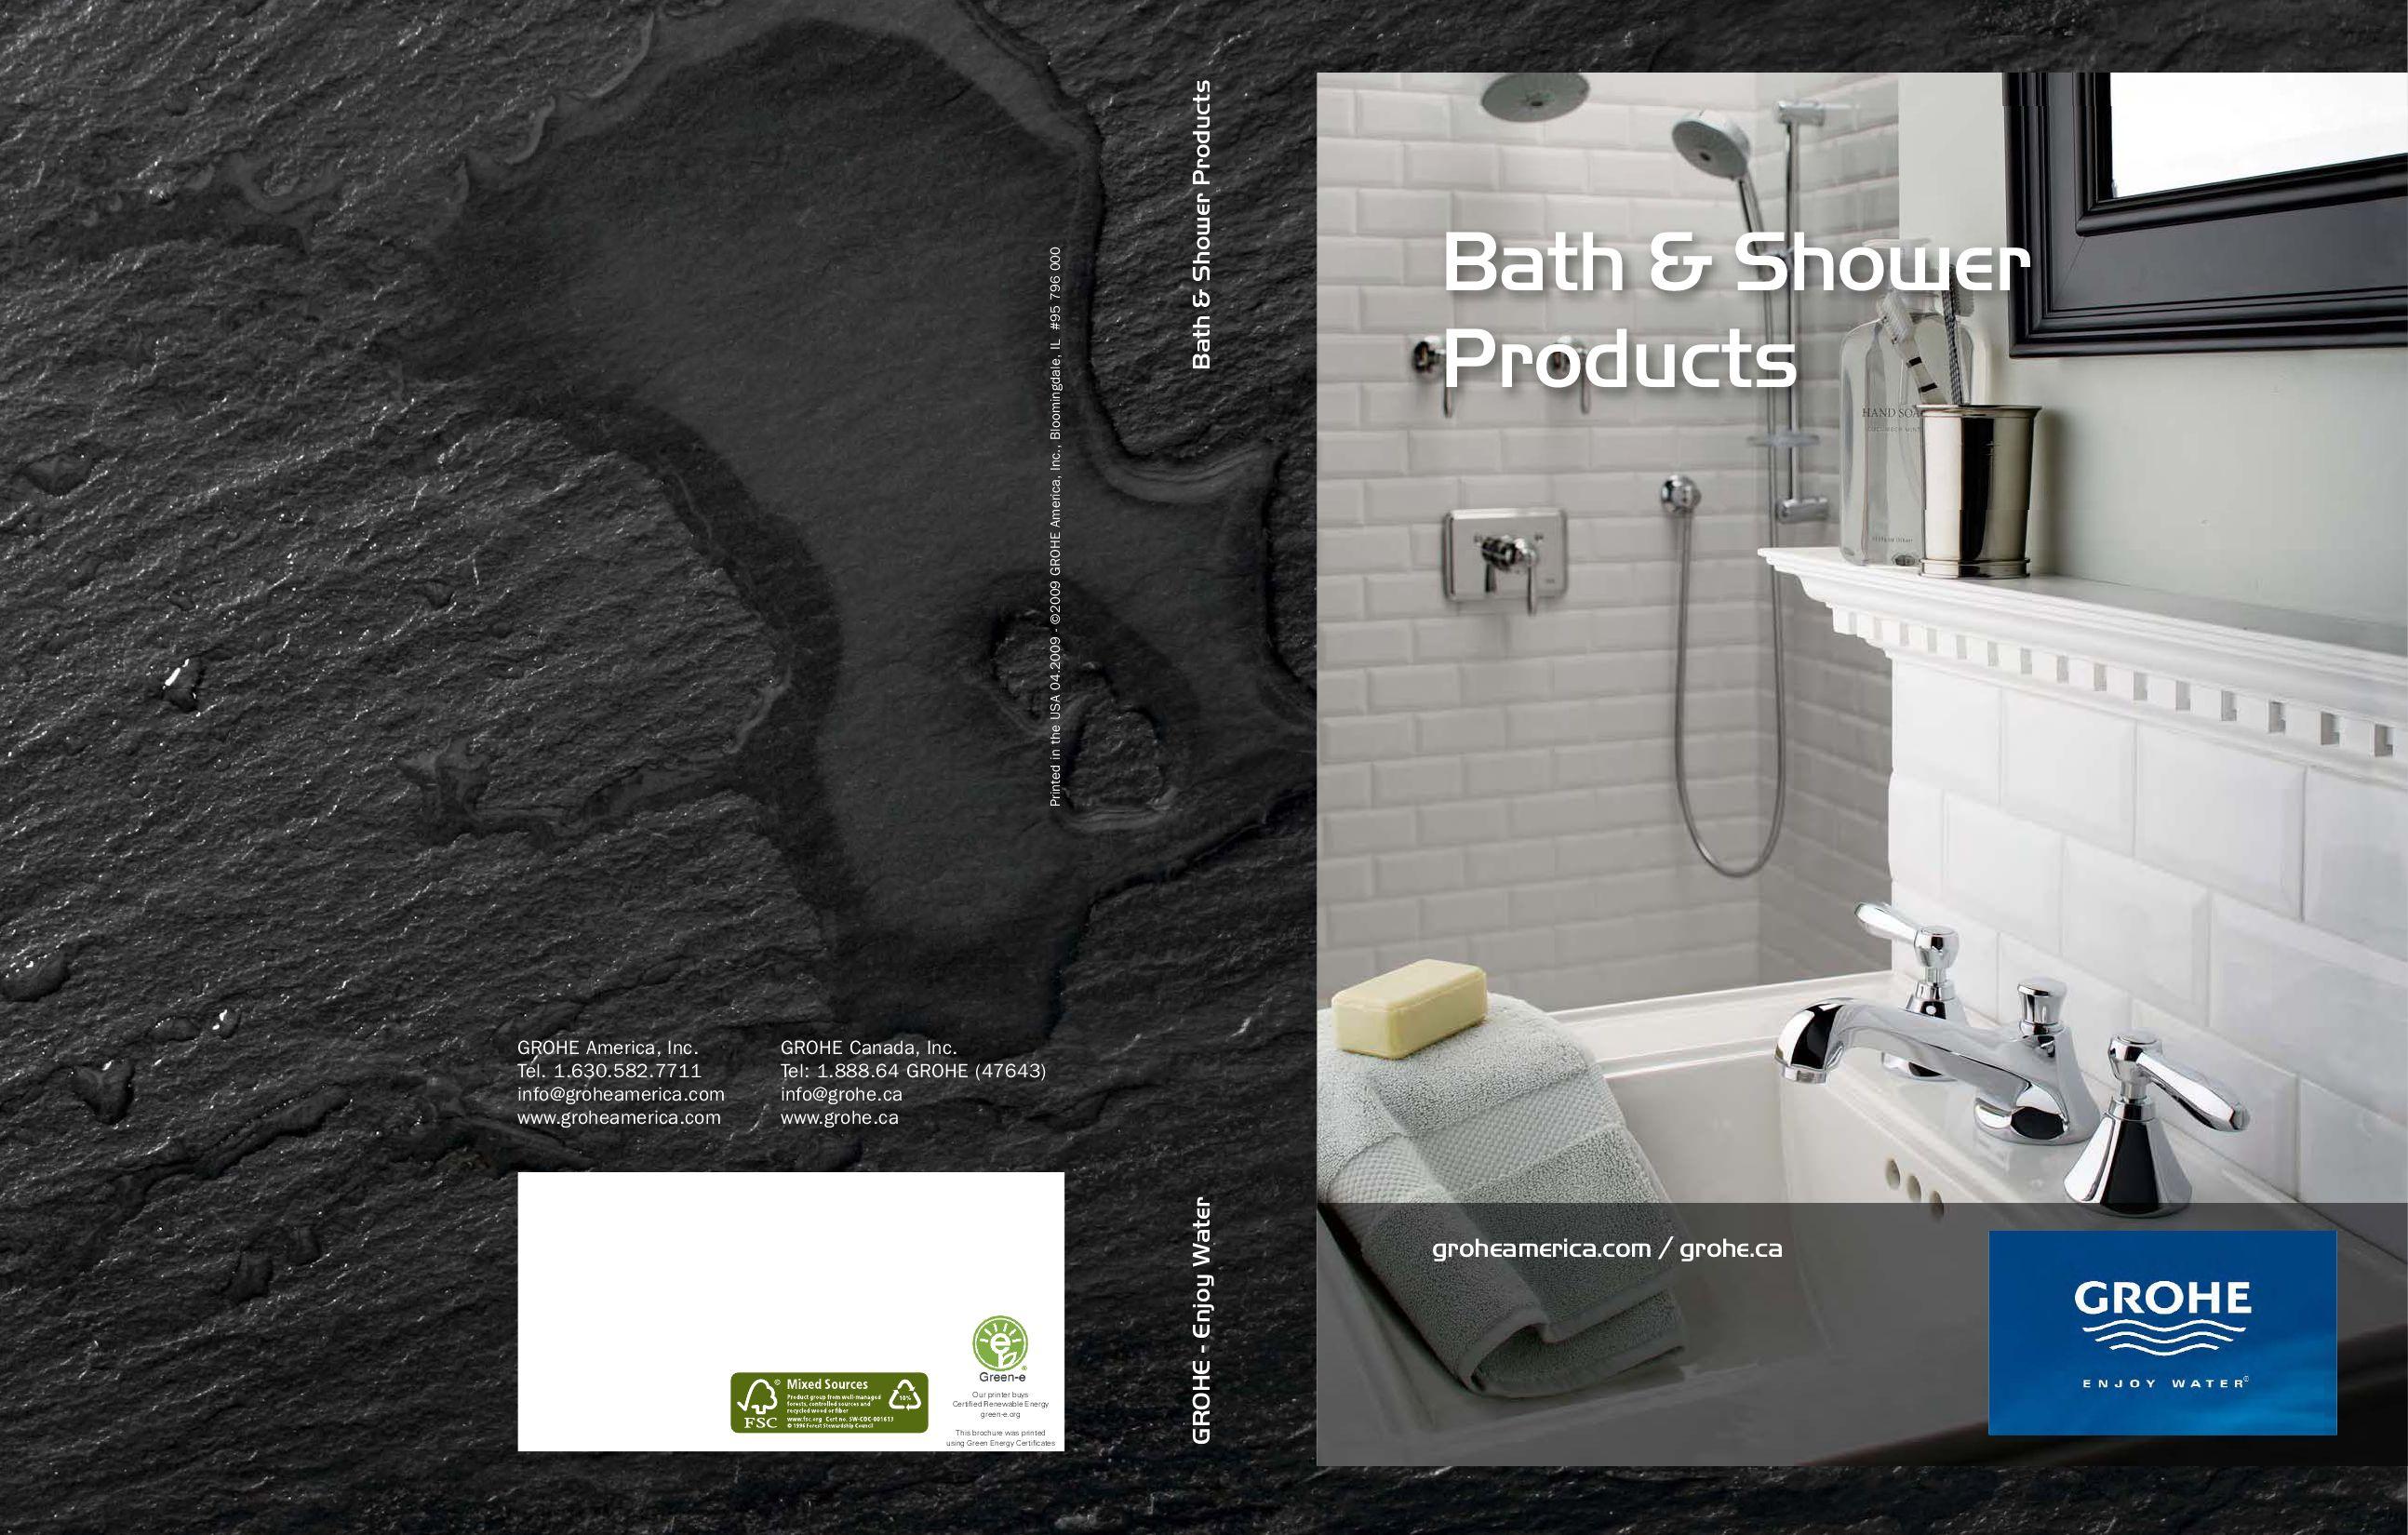 Grohe Bath & Shower Products Catalog by 5kMedia - issuu